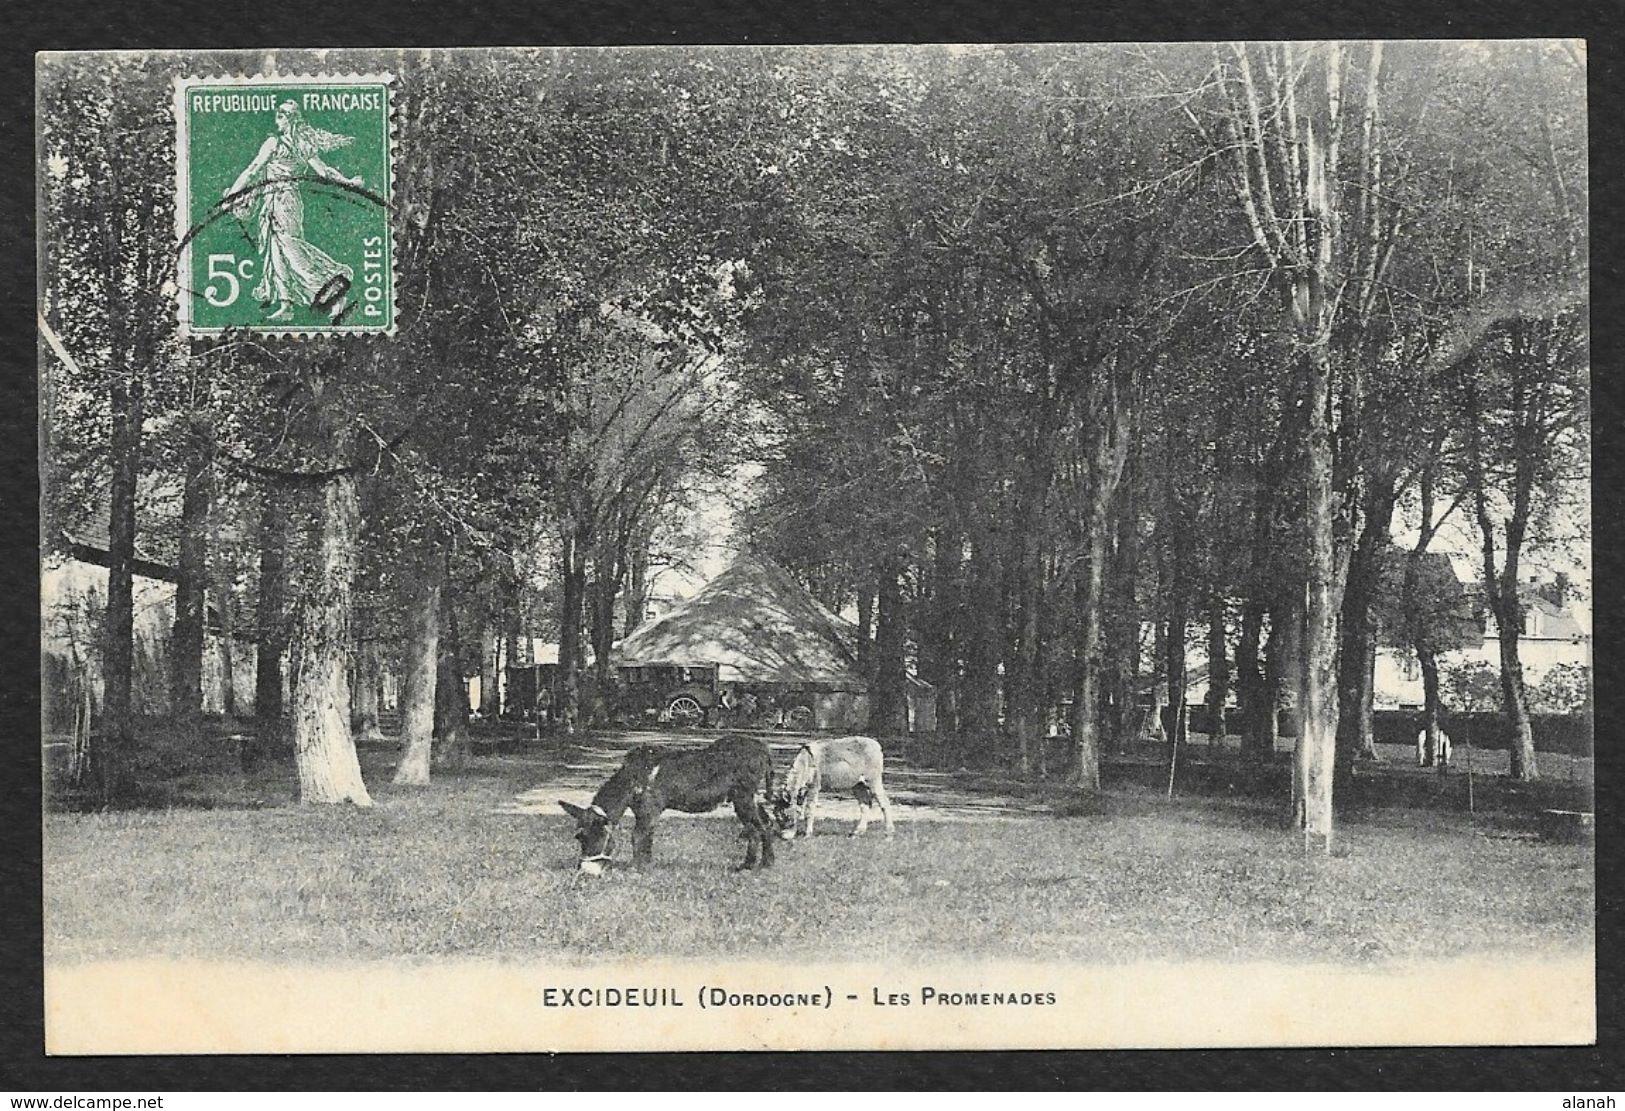 EXCIDEUIL Rare Les Promenades Anes () Dordogne (24) - France